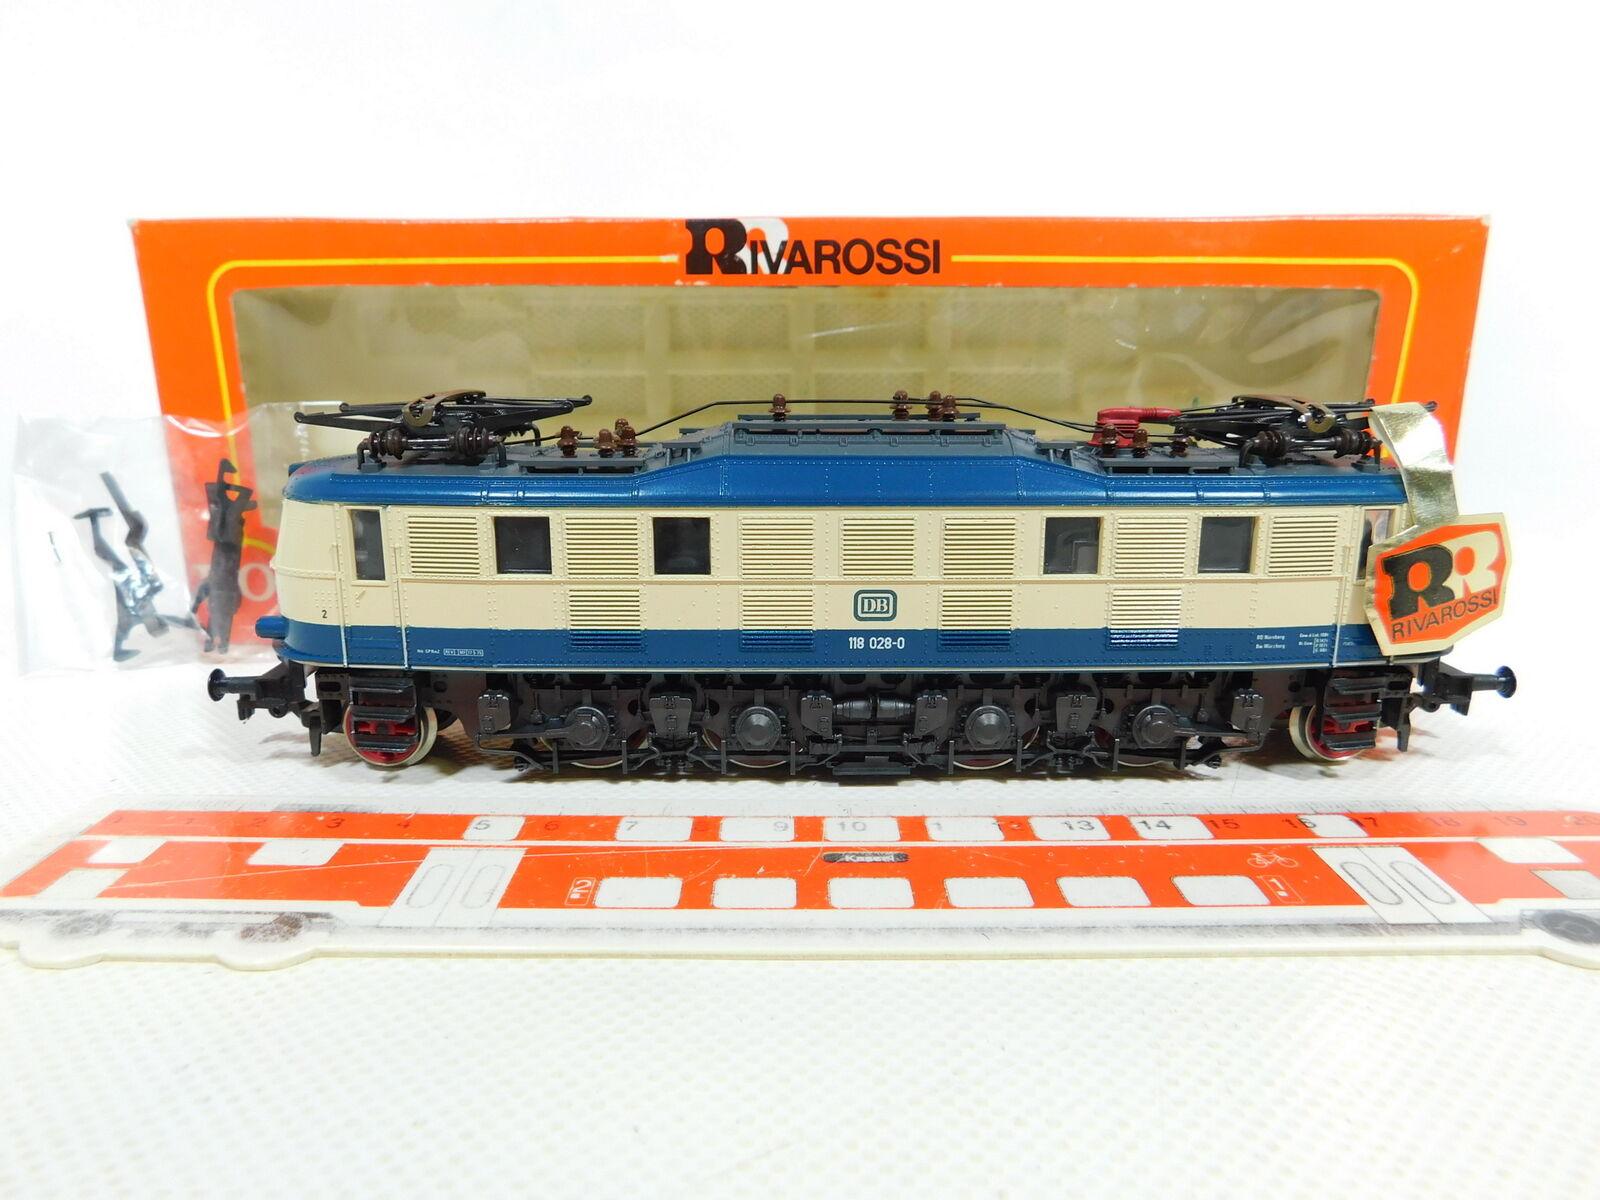 Bv880-1Rivarossi h0 dc 1672 e-LOK e-locomotora 118 028-0 DB, muy bien + embalaje original